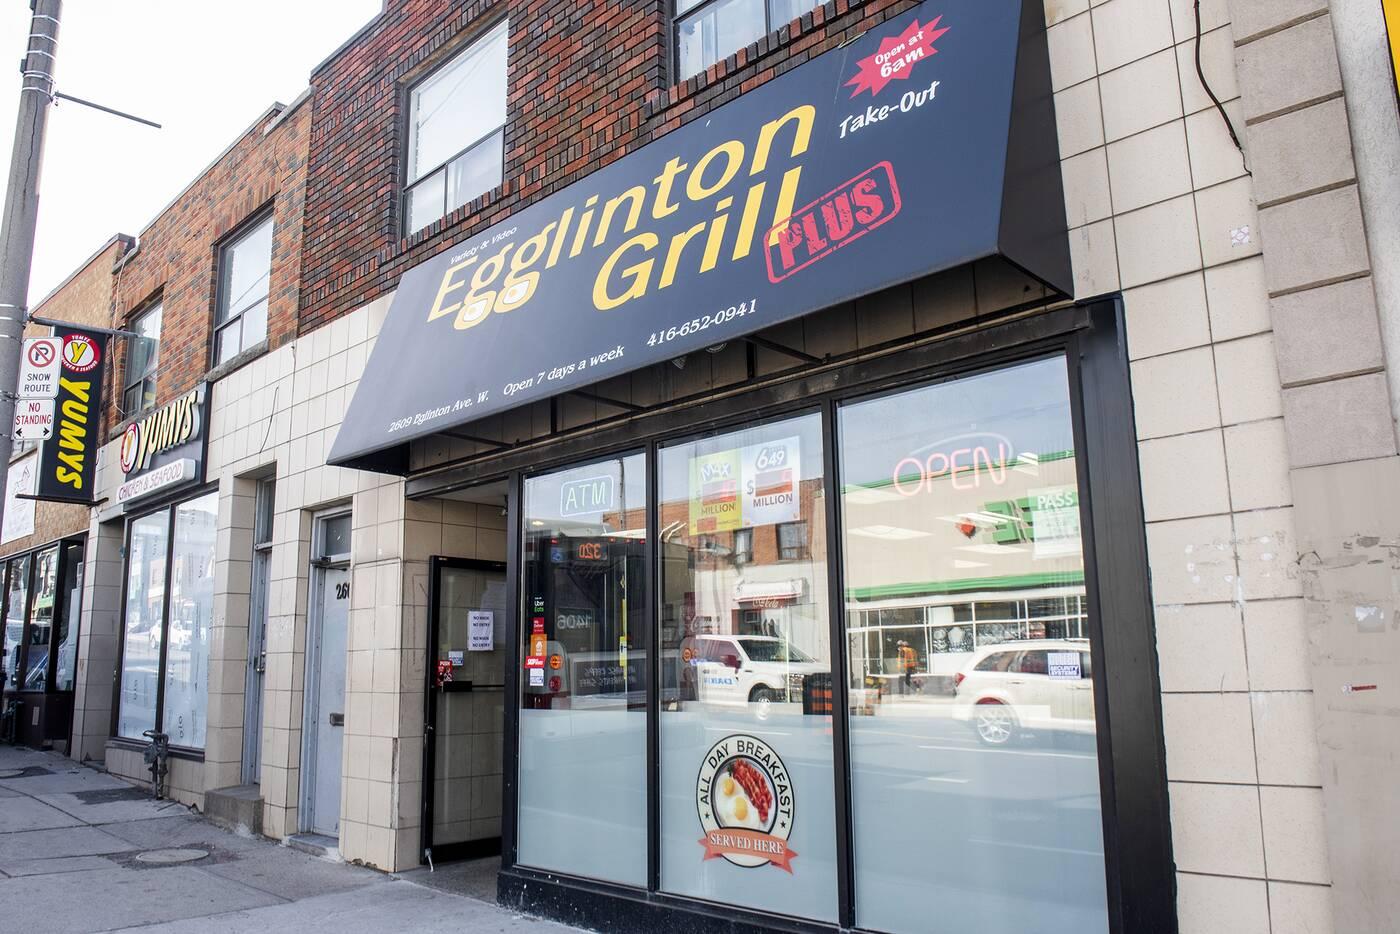 Egglinton Grill Toronto